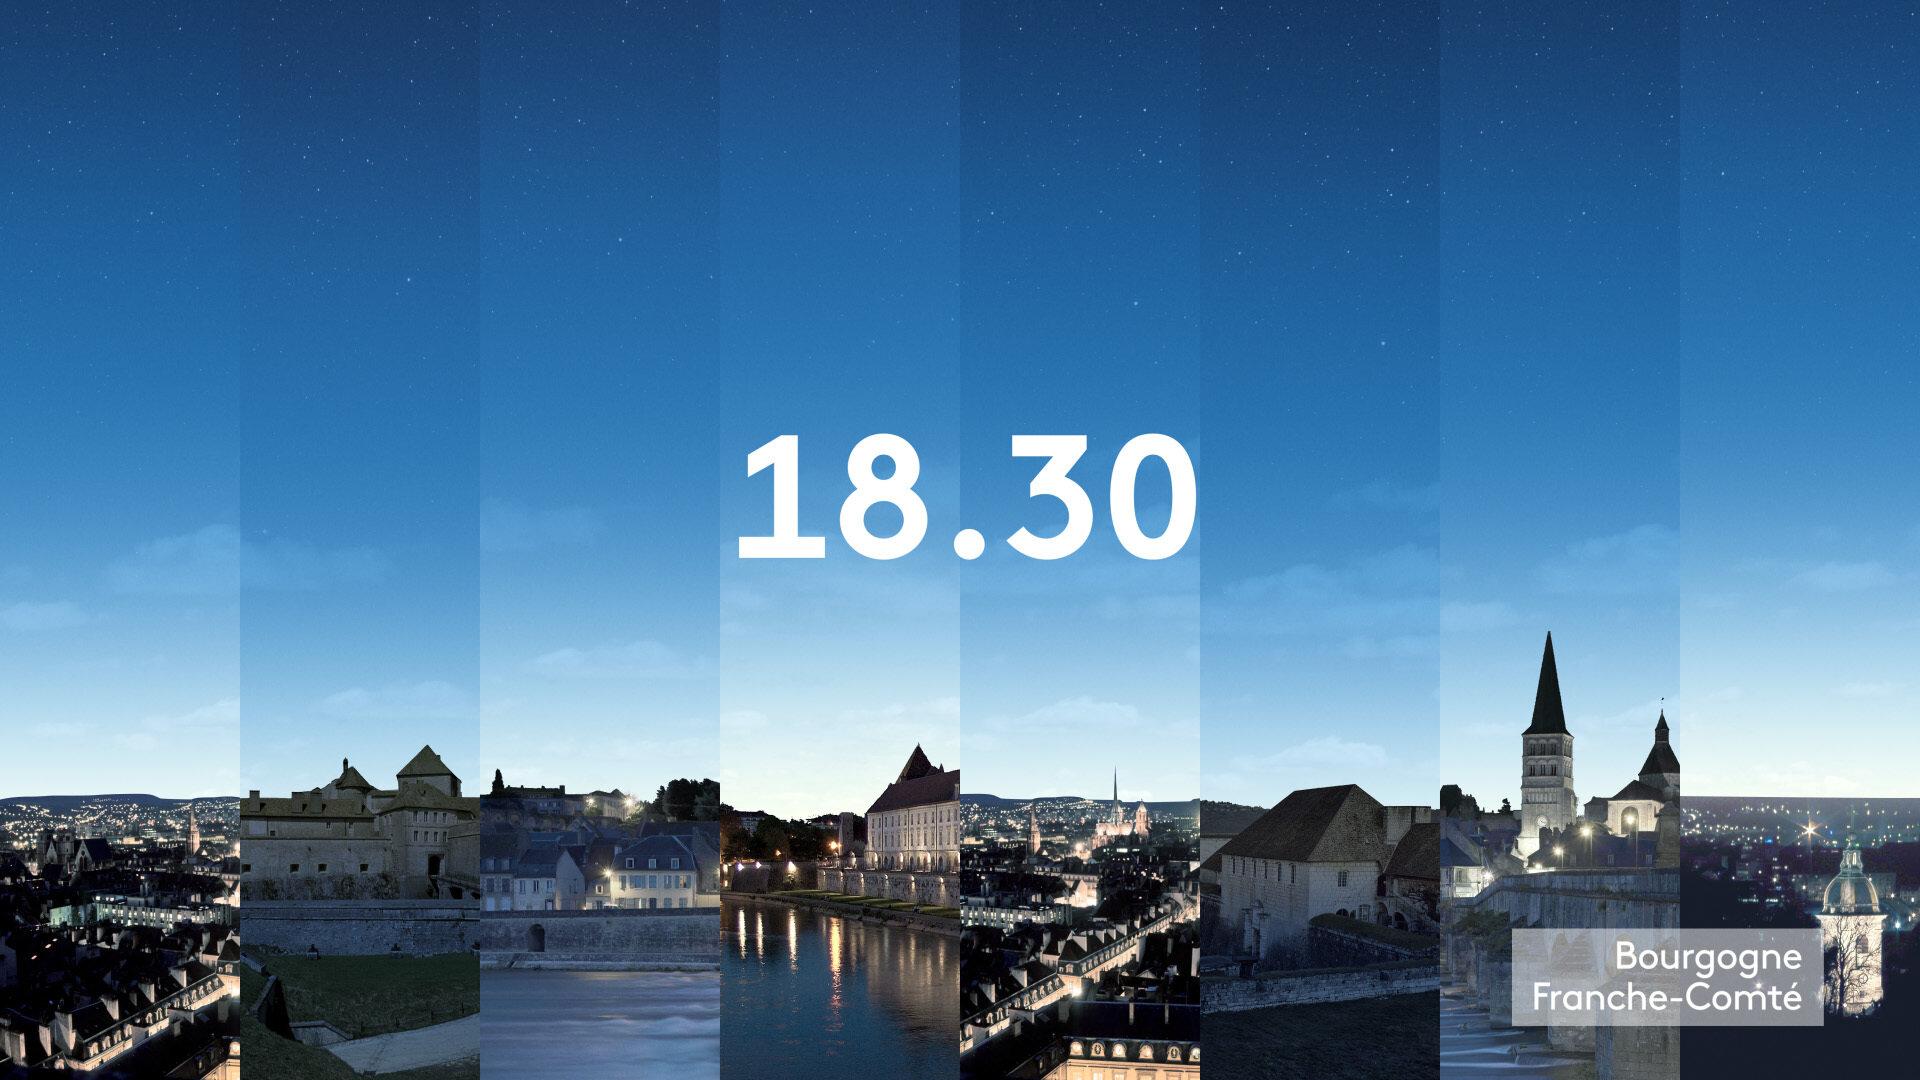 18h30 - Bourgogne-Franche-Comté